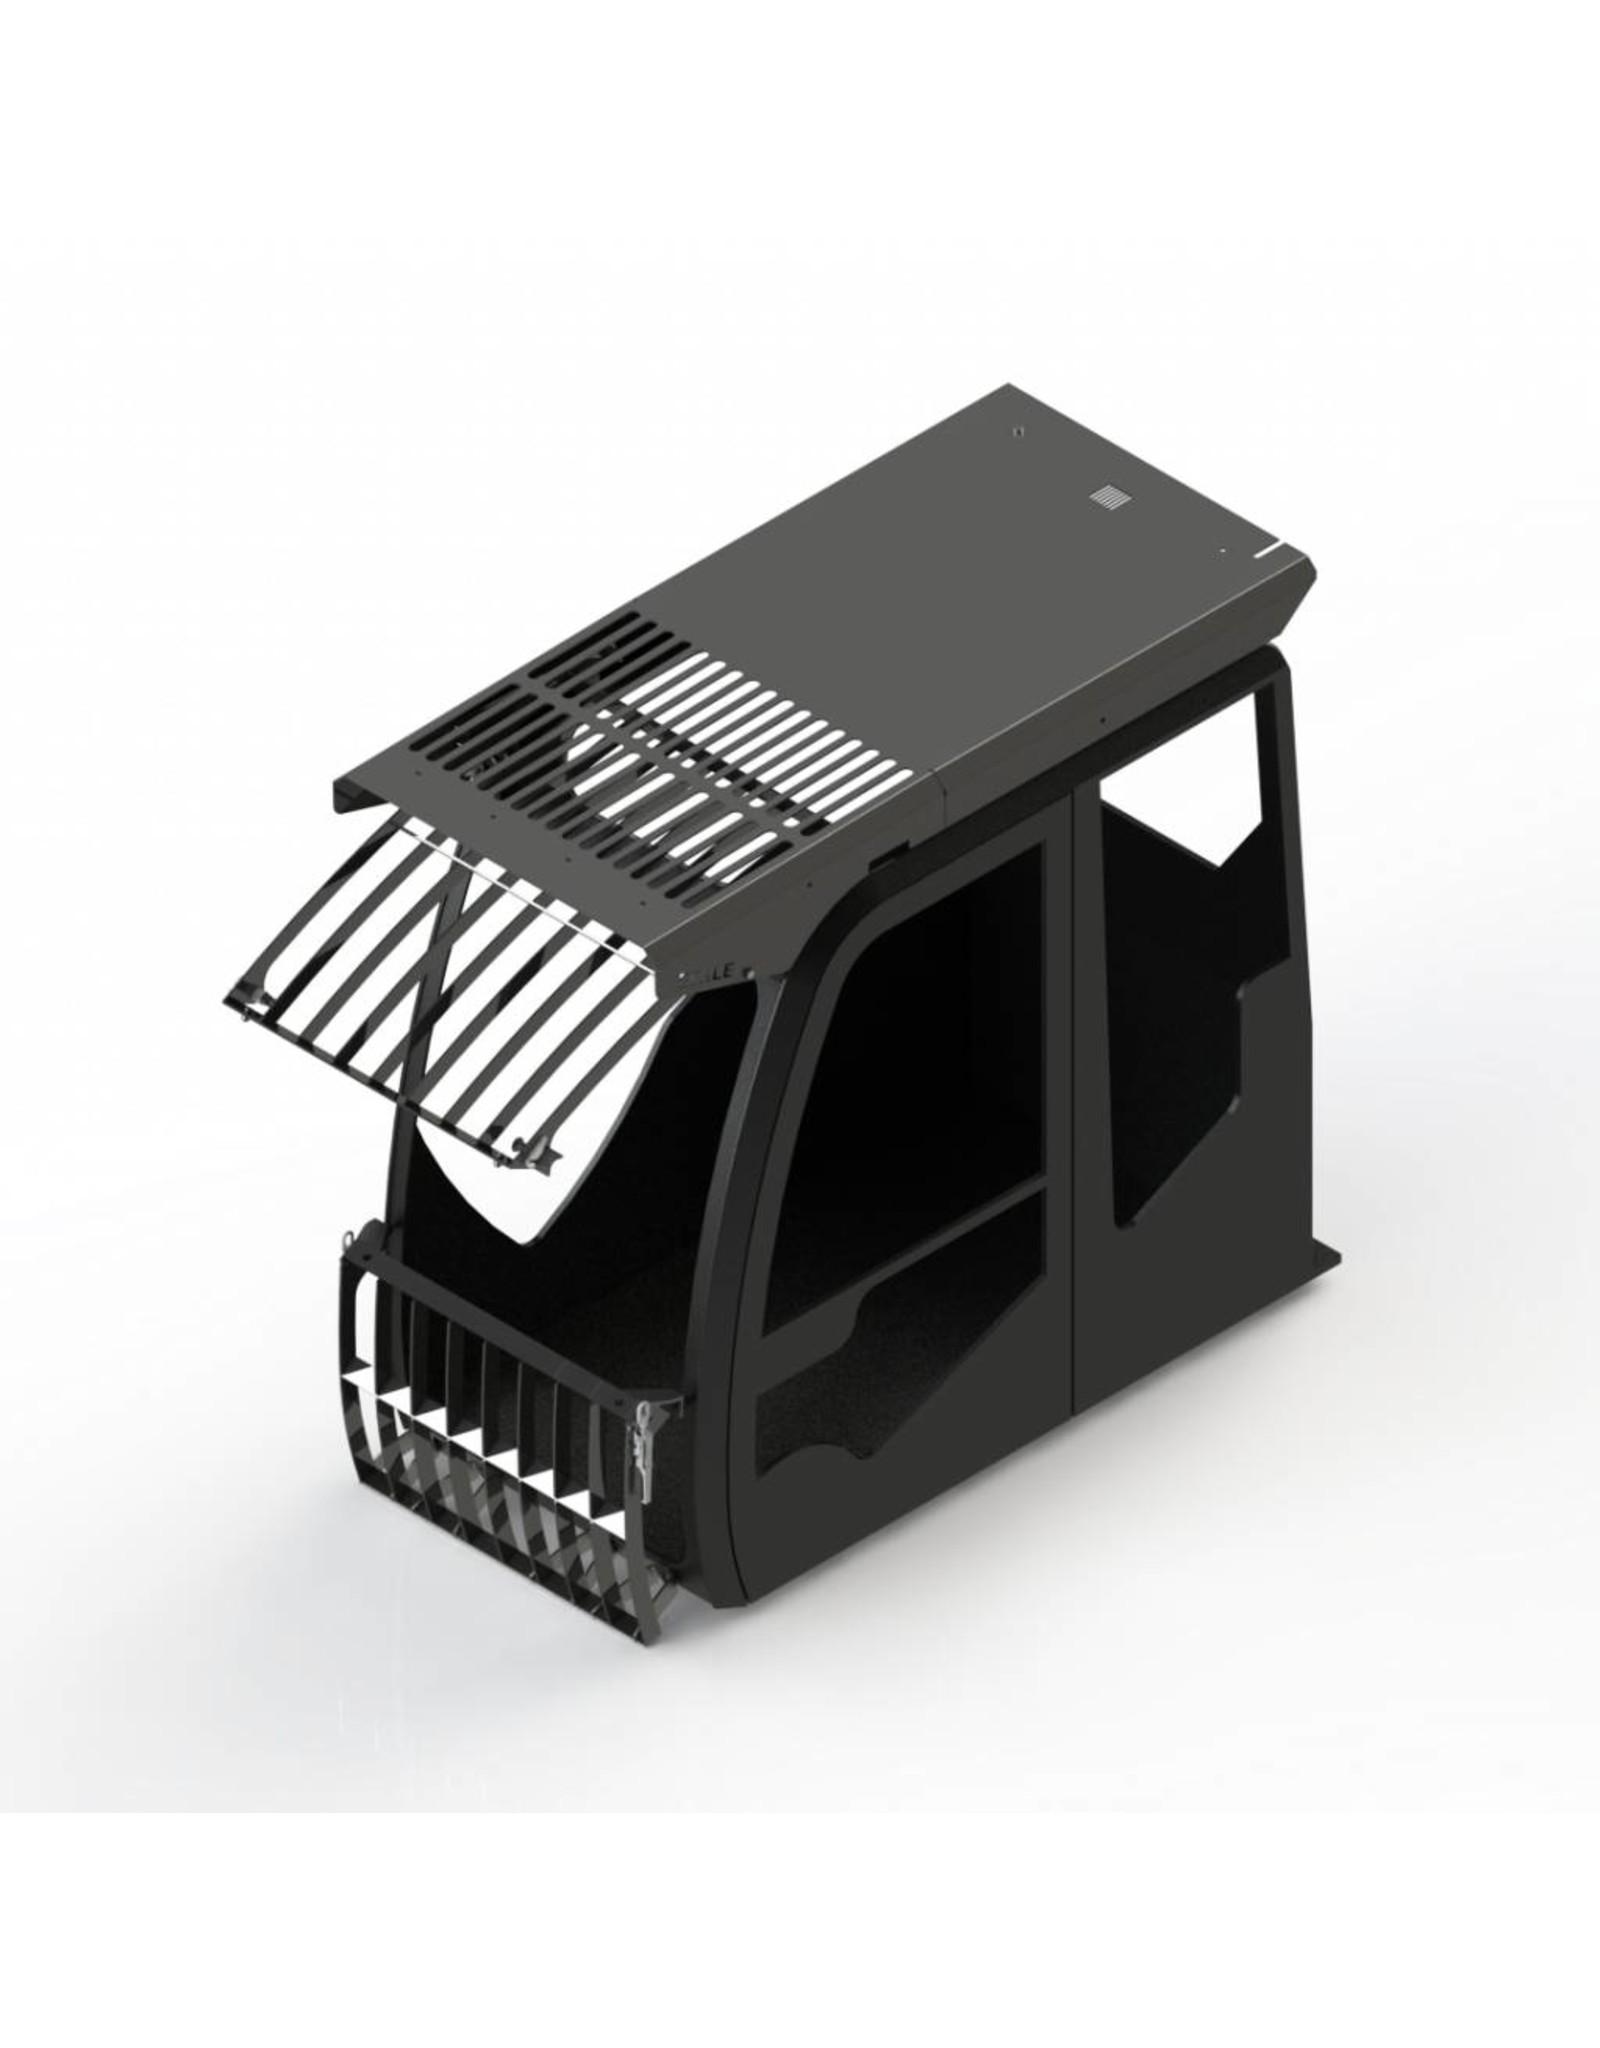 Echle Hartstahl GmbH FOPS for Sany SY235C